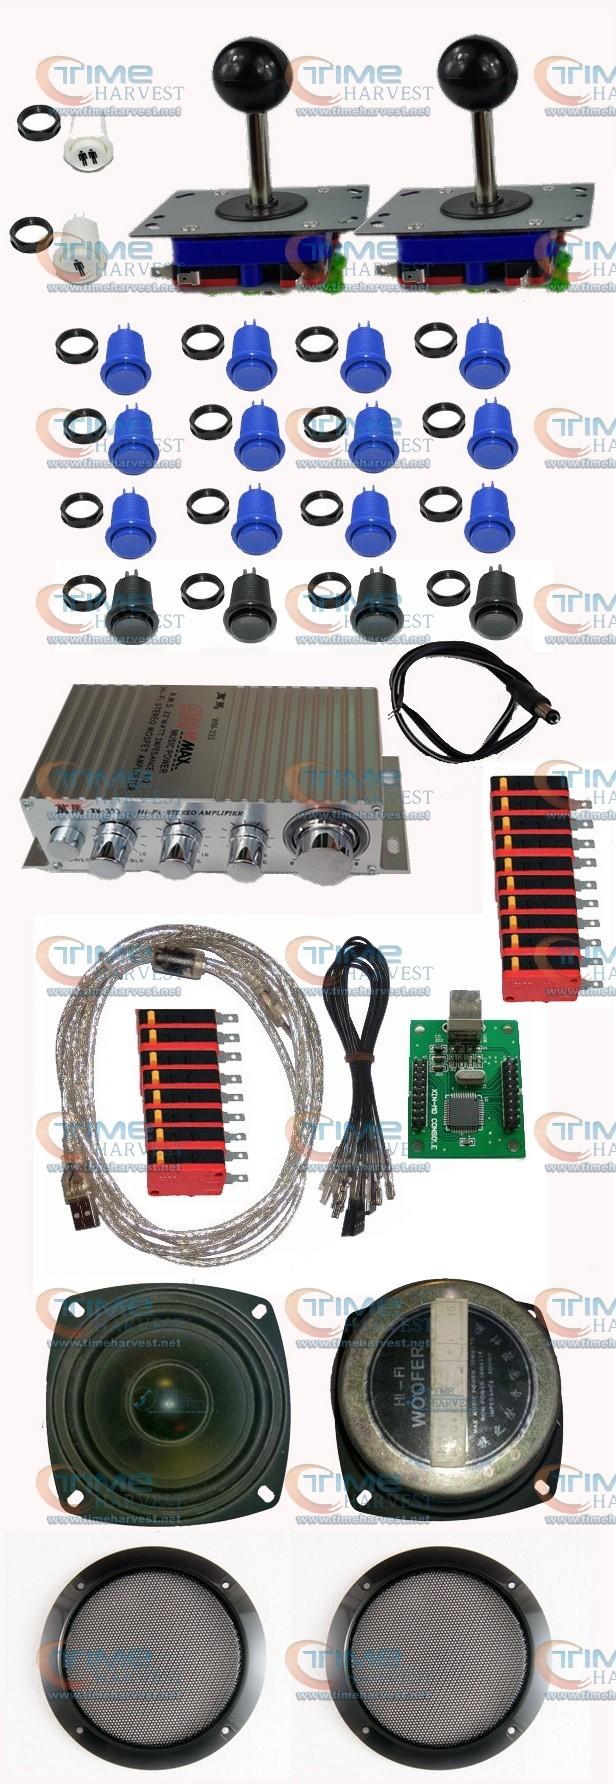 usb kit 118